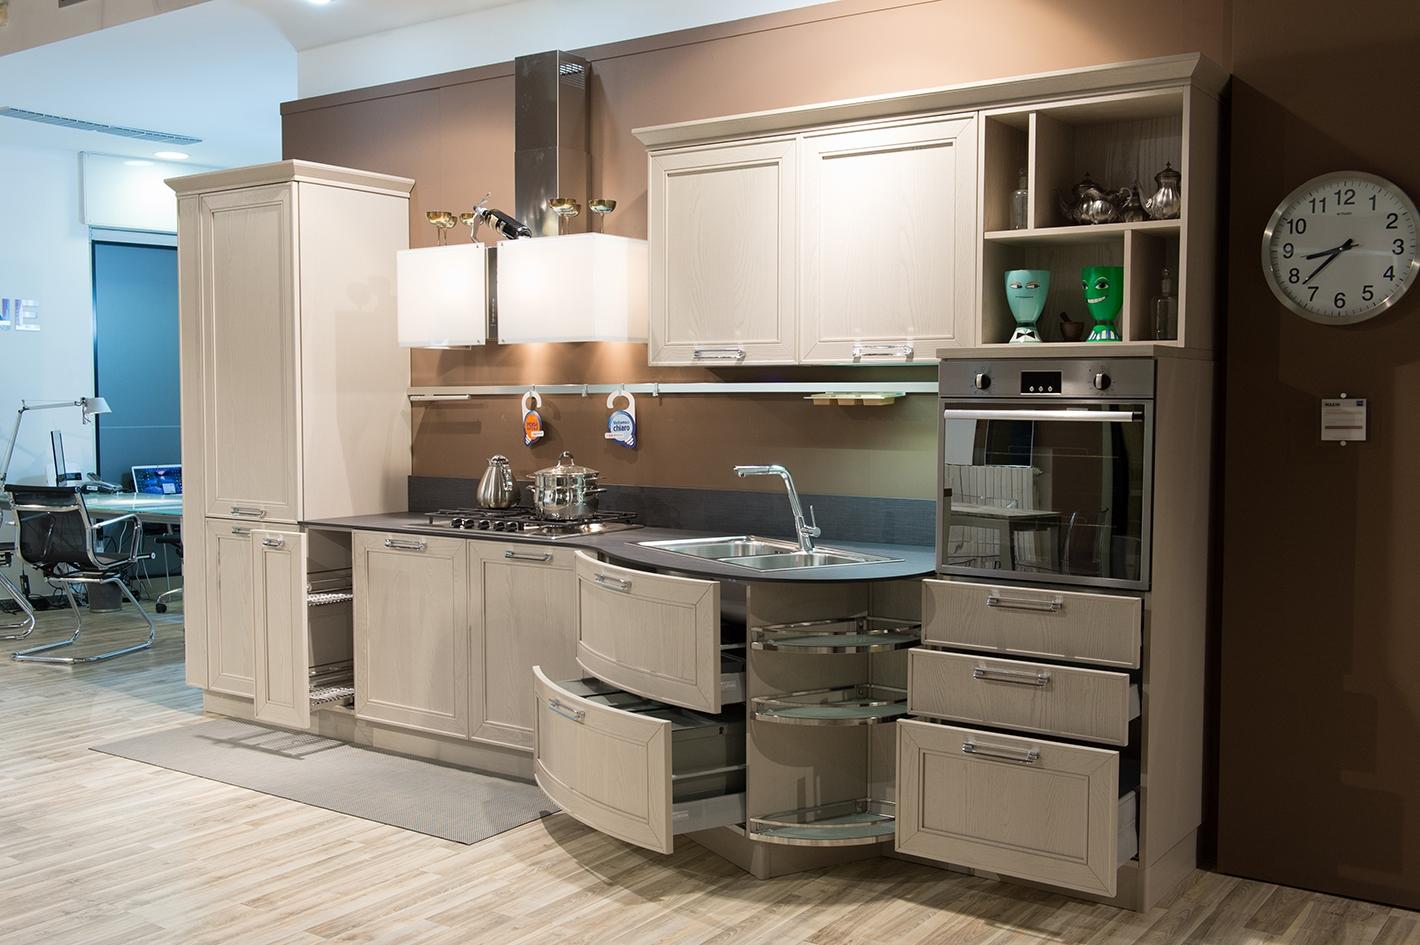 Stosa cucine cucina maxim classica legno cucine a prezzi for Prezzi cucine componibili